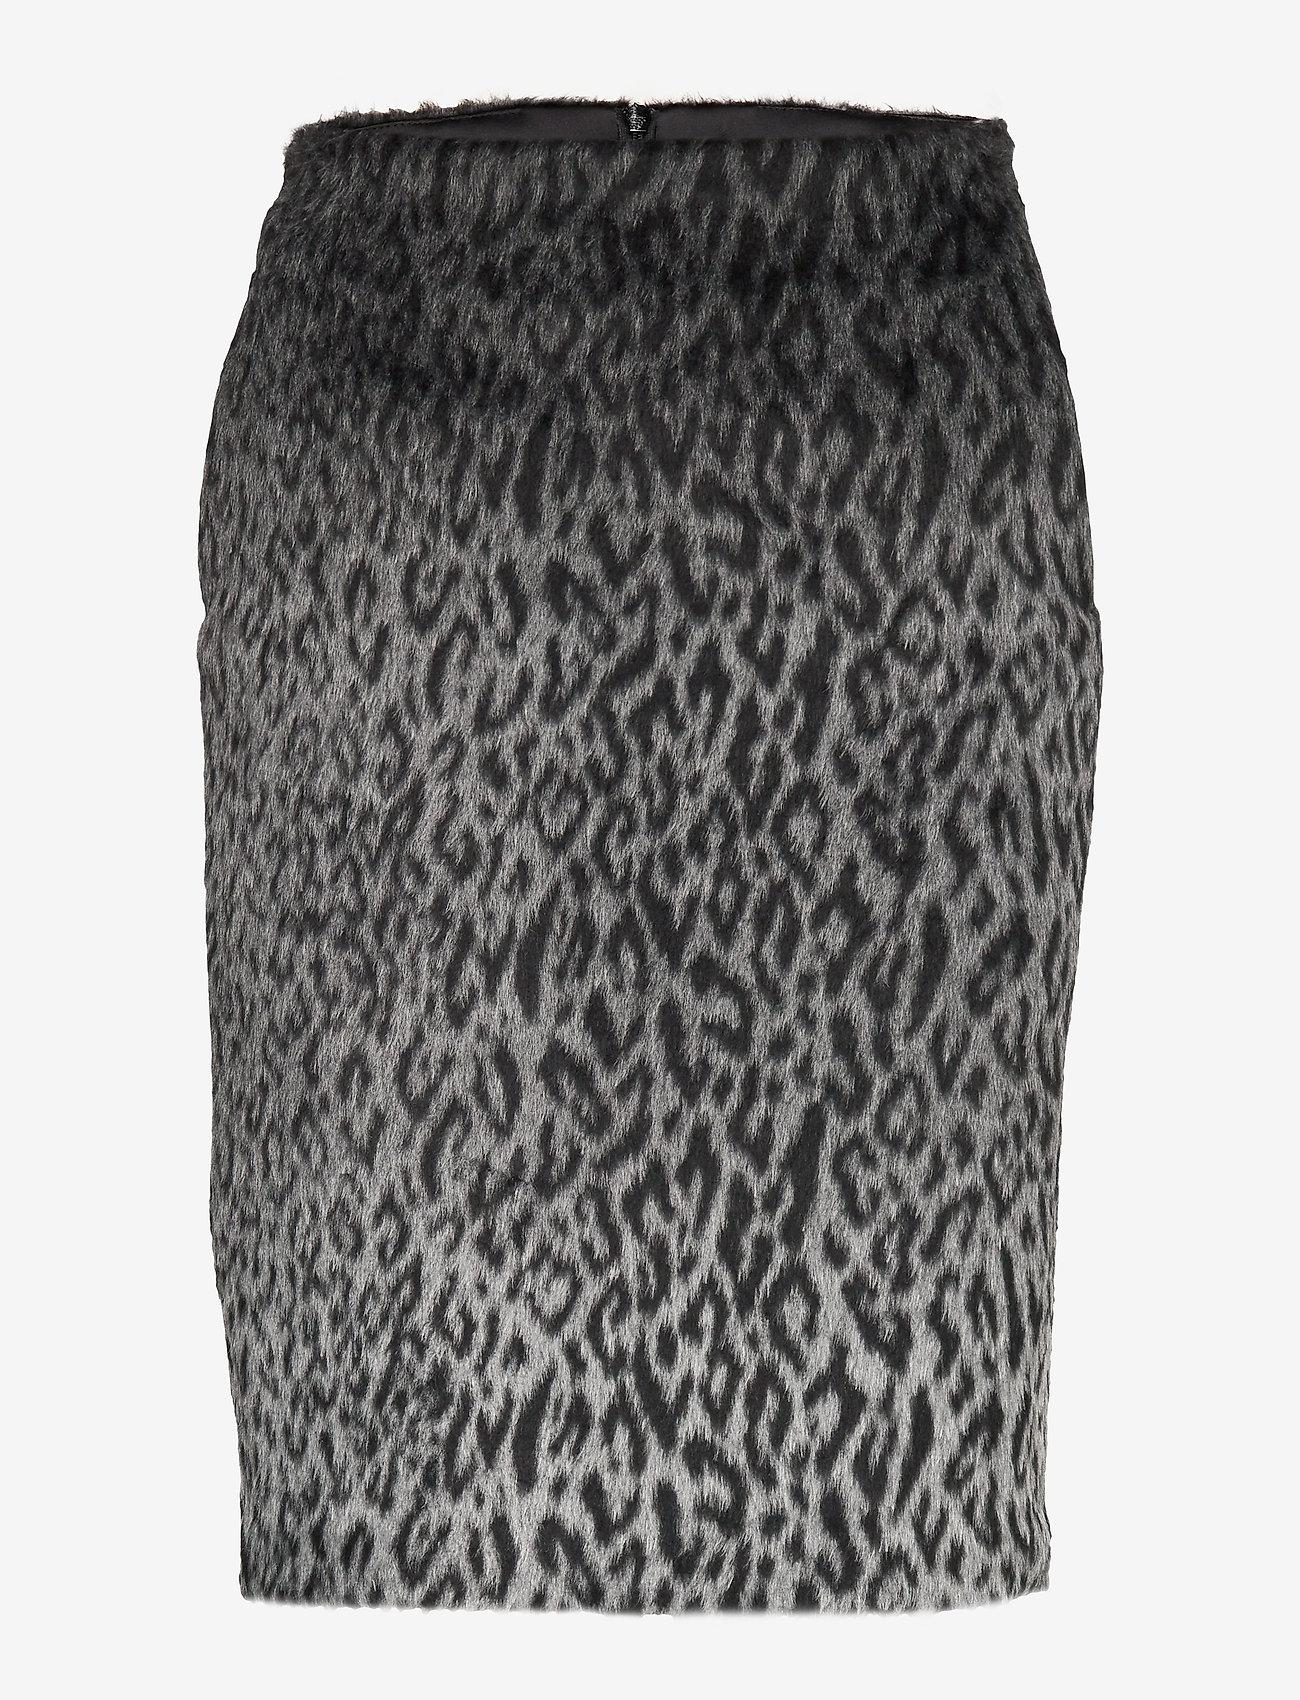 Karl Lagerfeld - Karl X Carine Leopard Skirt - kynähame - black/gray - 0